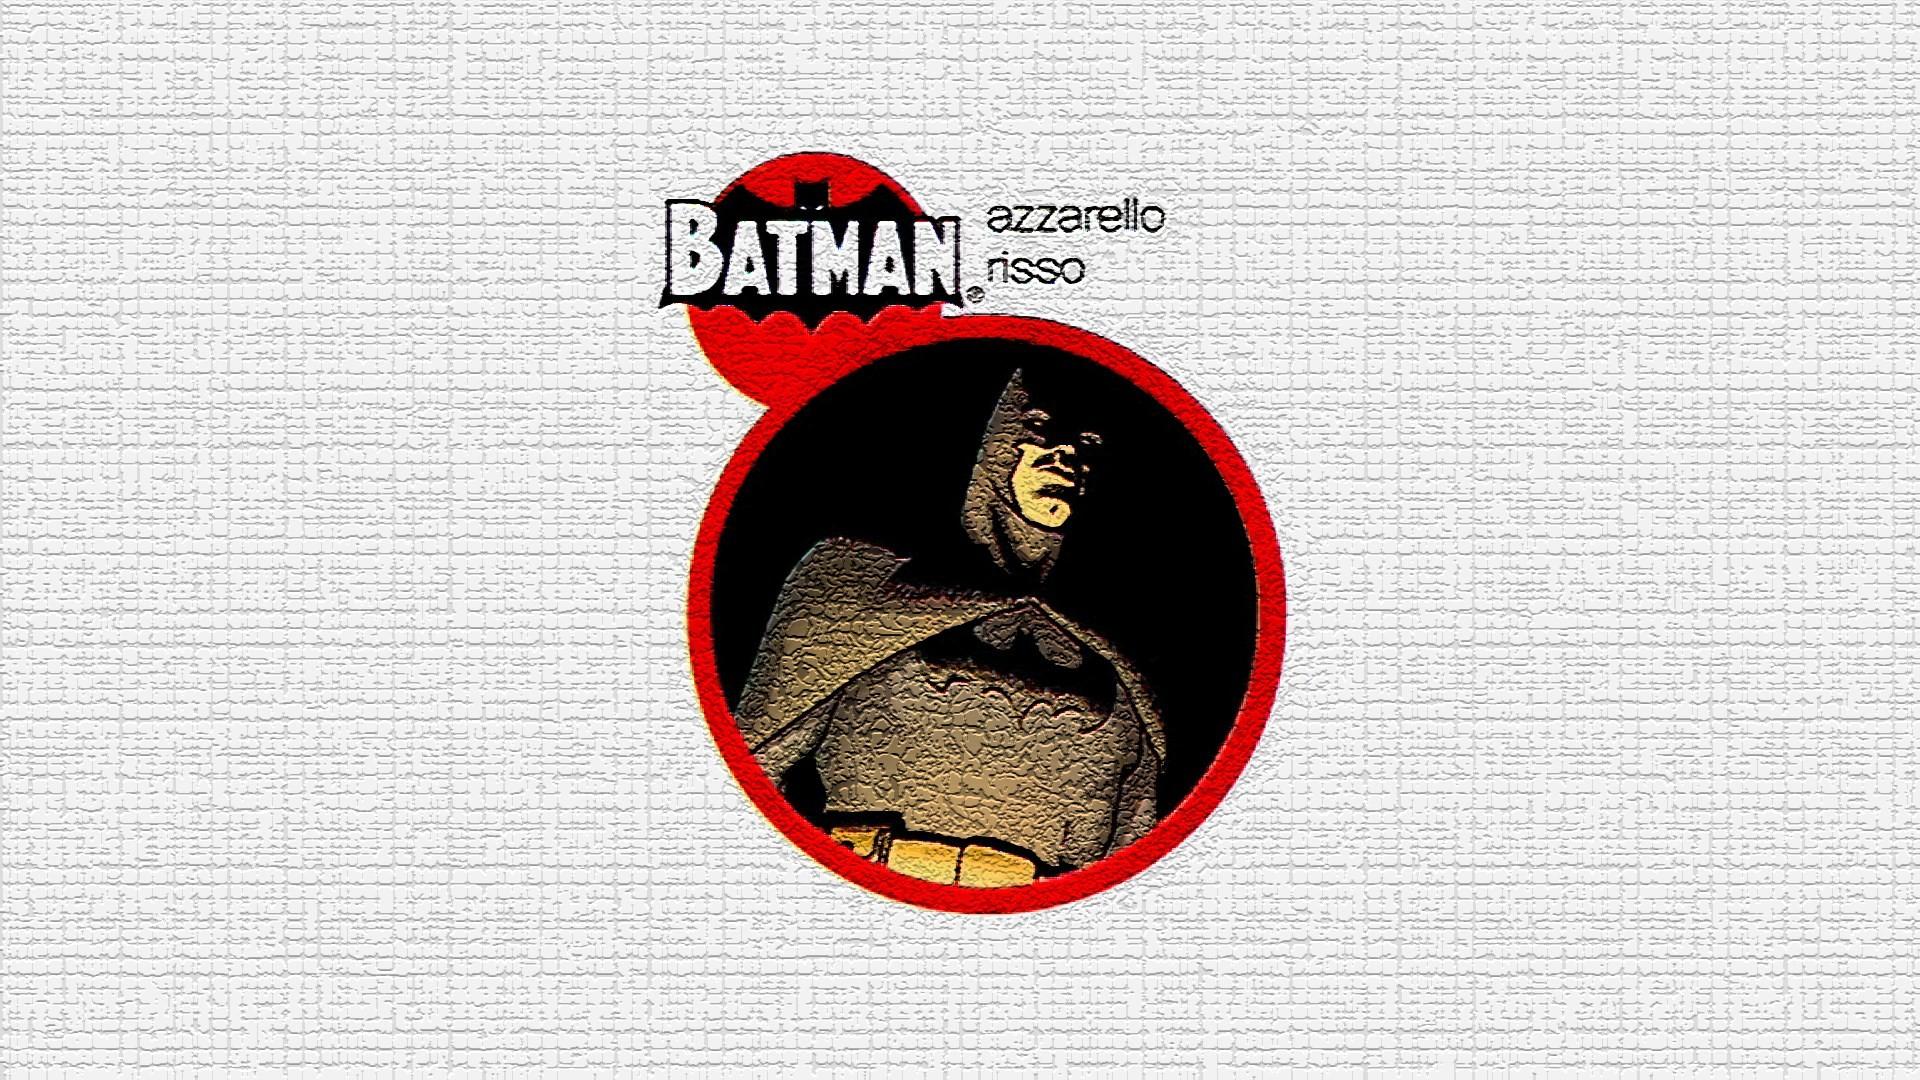 Free screensaver batman wallpaper, Lenwood Smith 2017-03-21